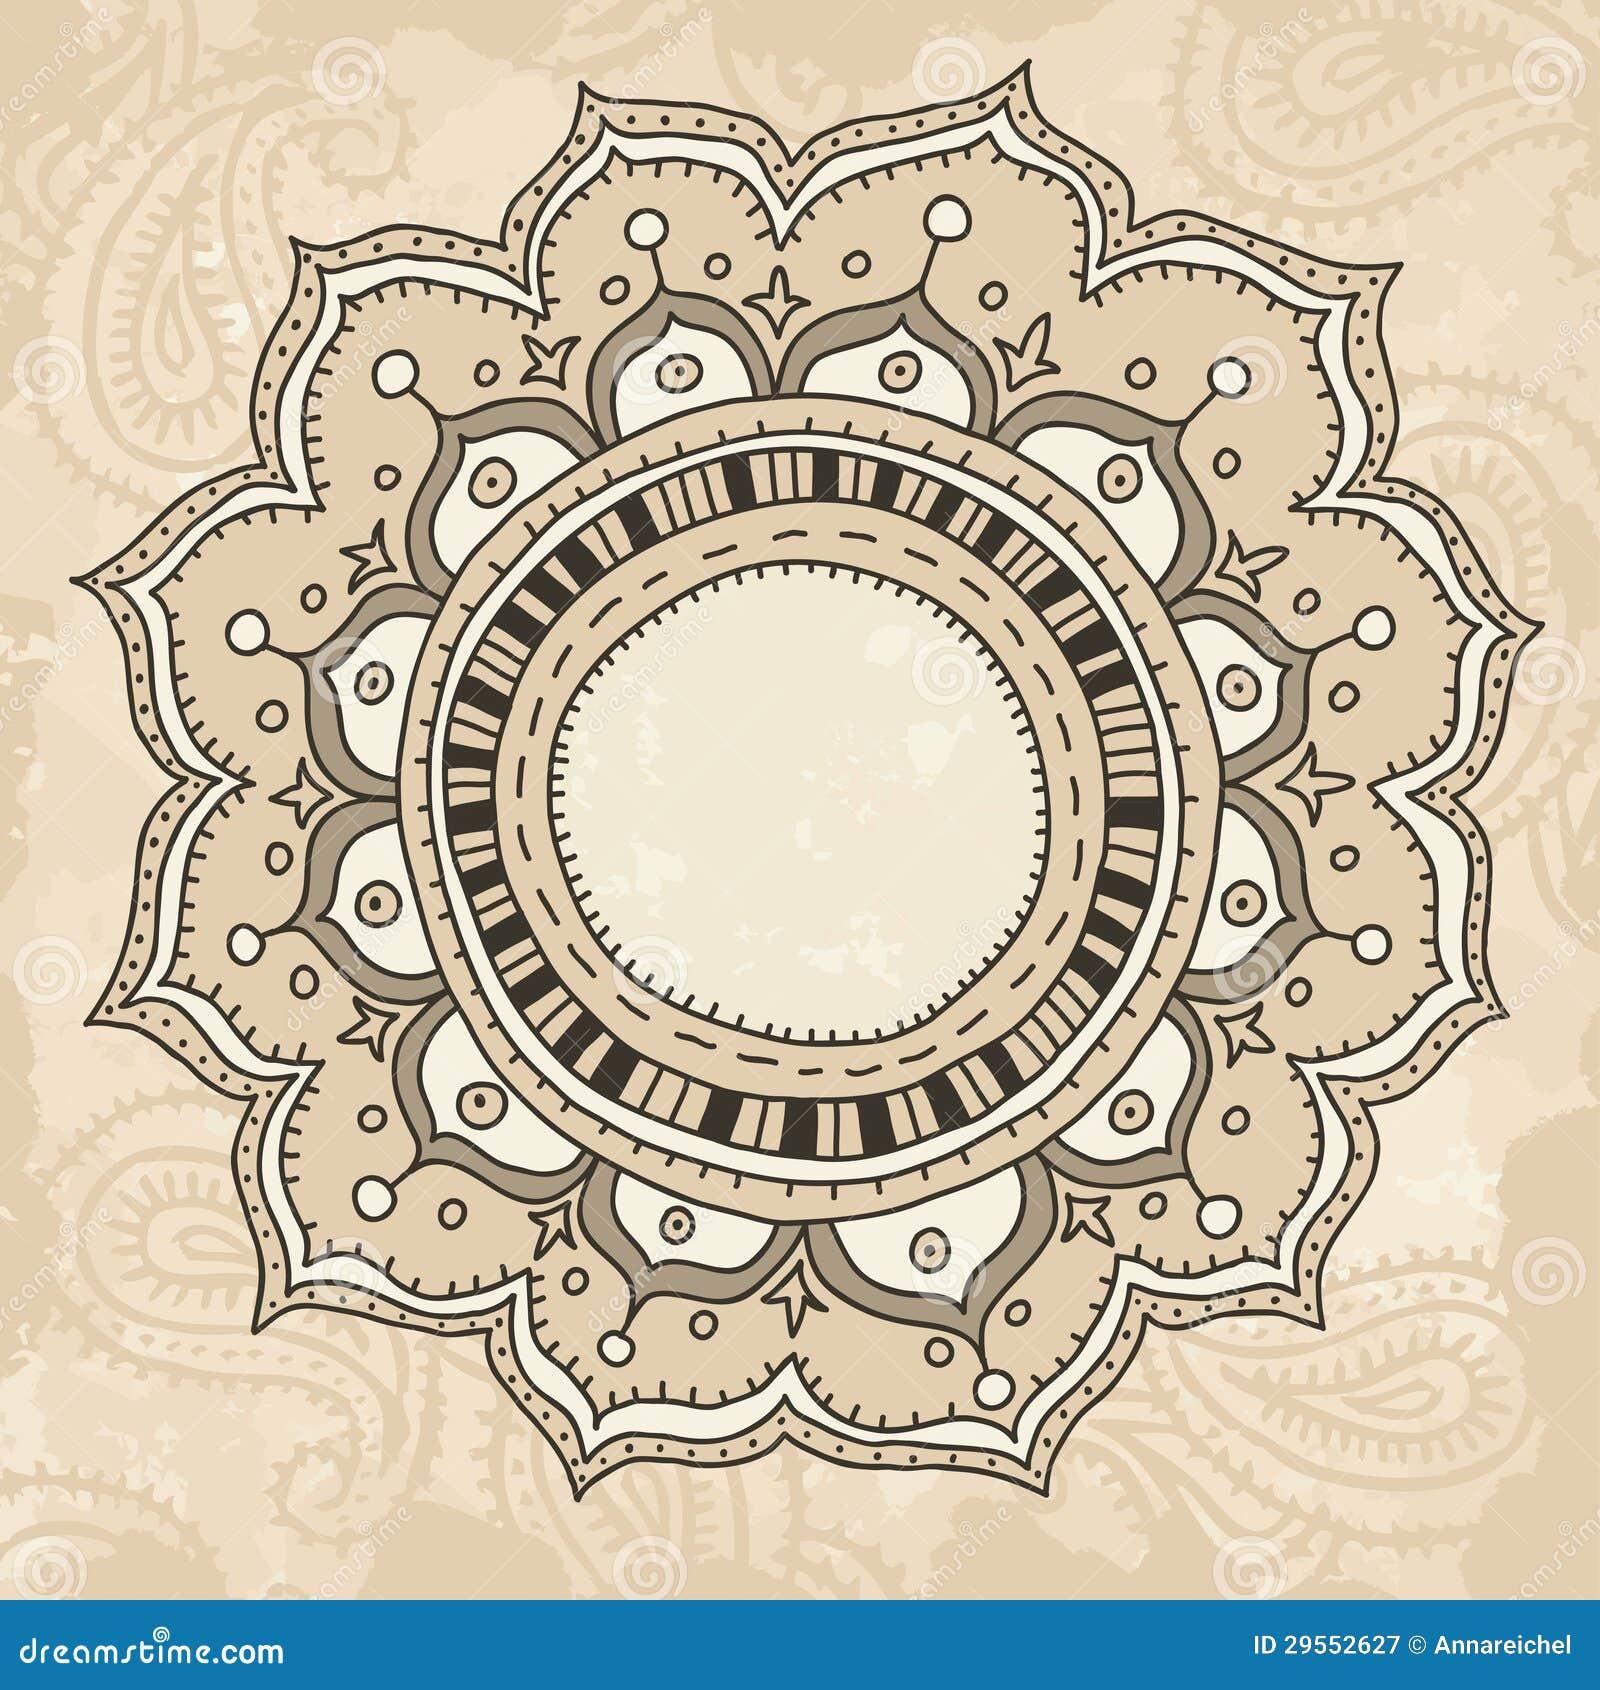 Mandala On Vintage Background Stock Vector - Illustration of paisley ...